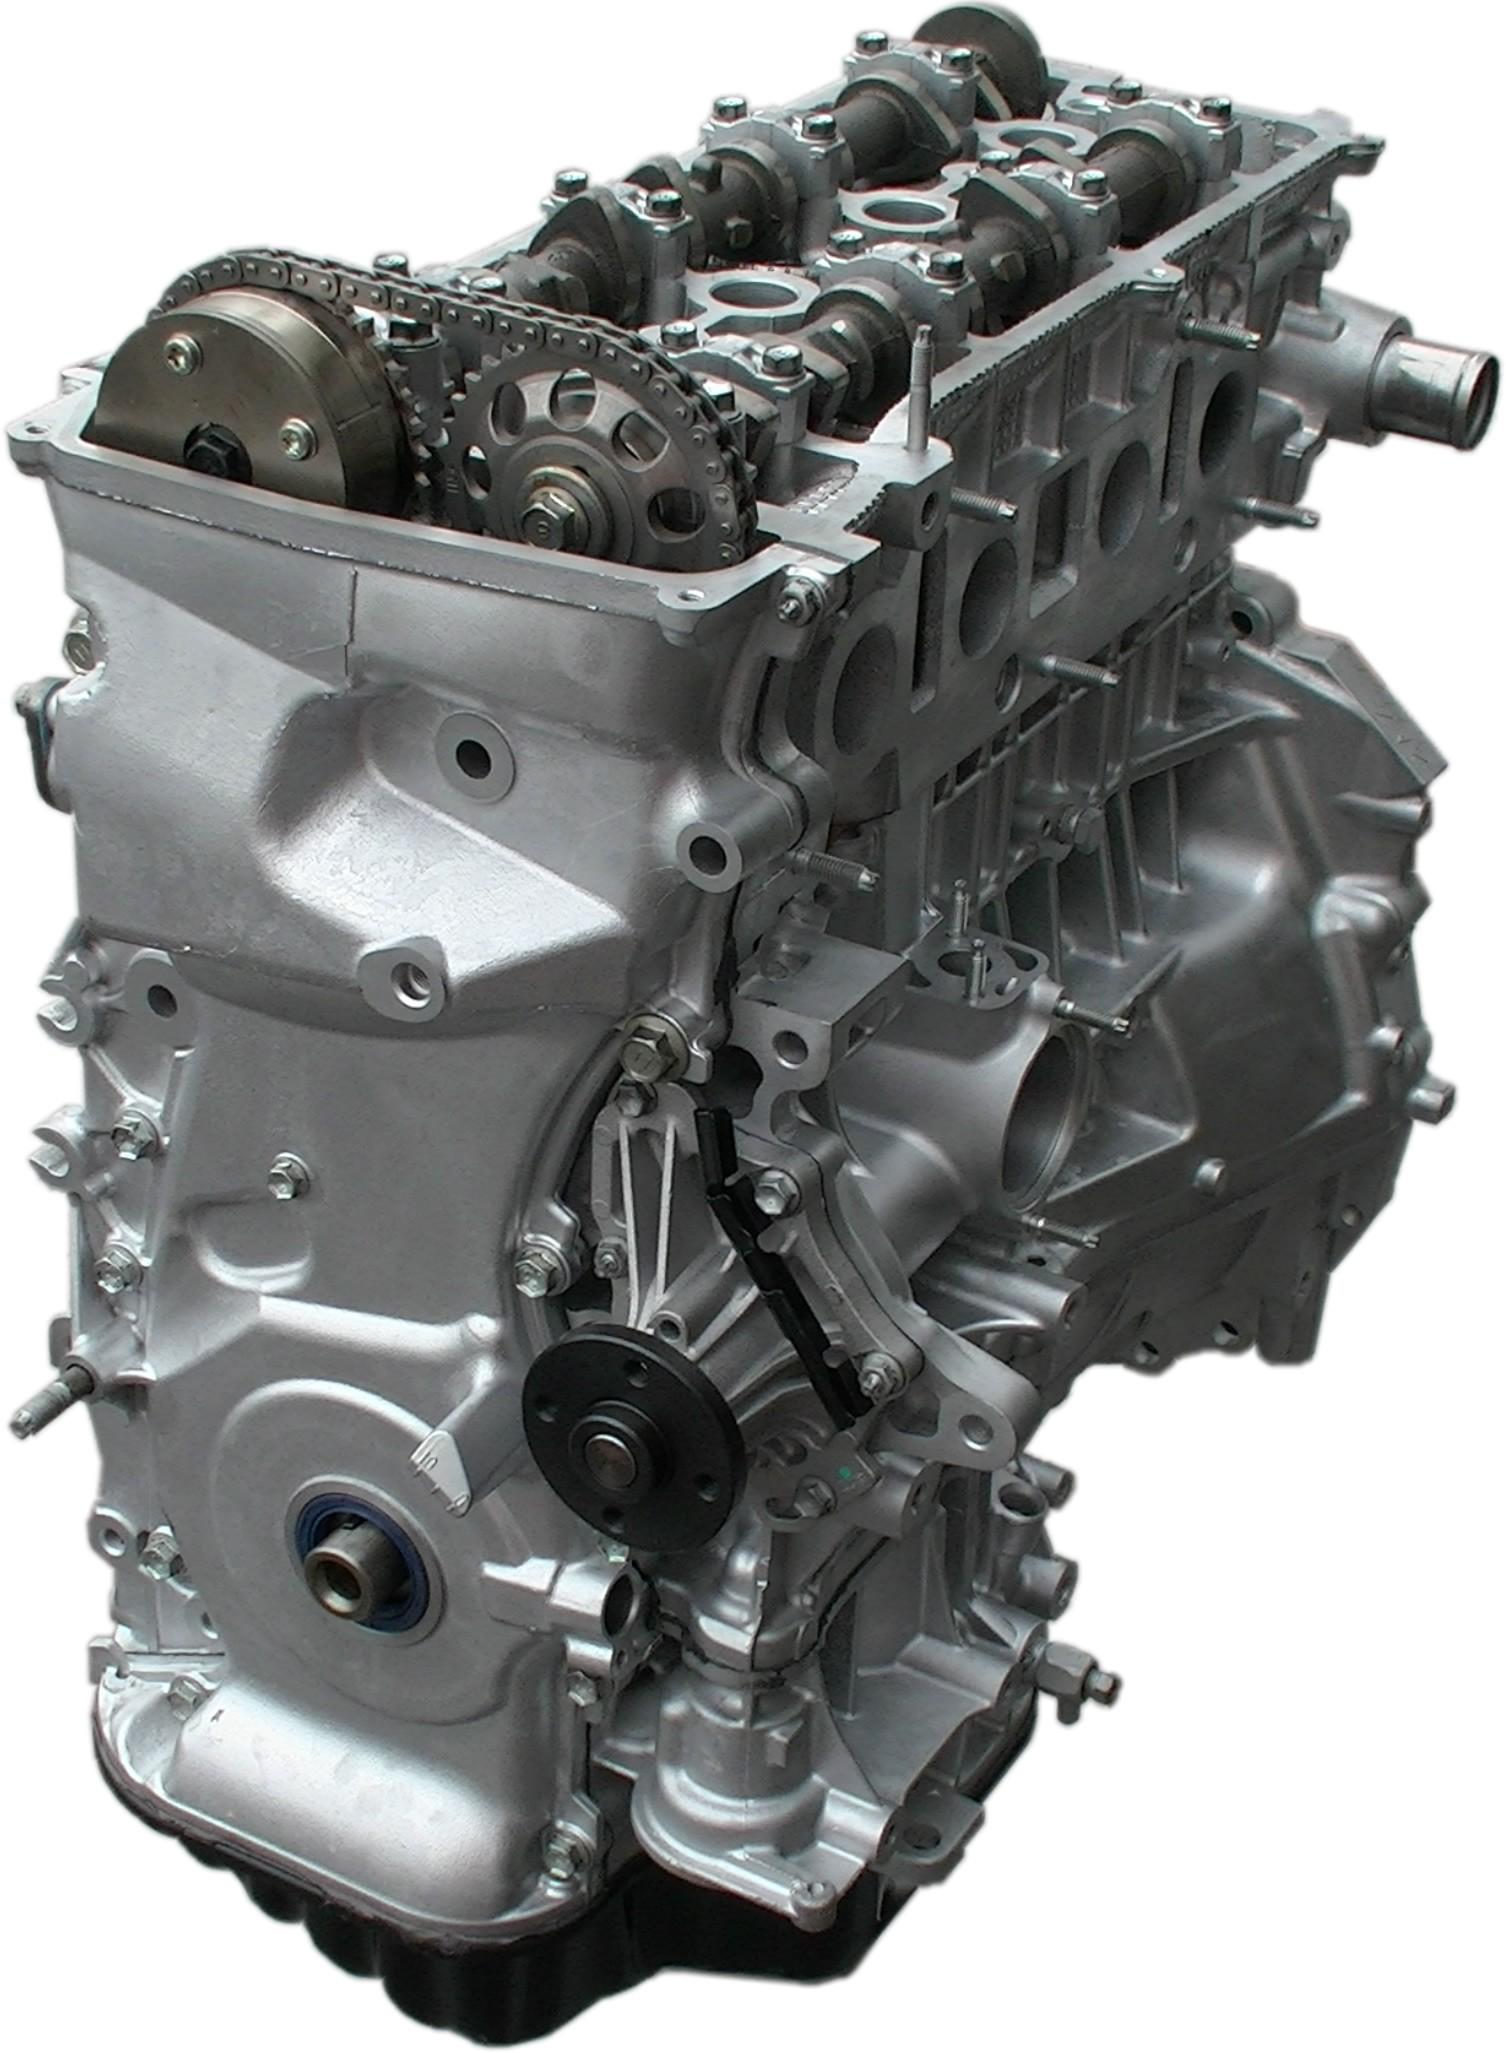 engine toyota 4l scion pontiac tc vibe 4cyl rebuilt 2azfe camry rav4 highlander longblock karking auto king